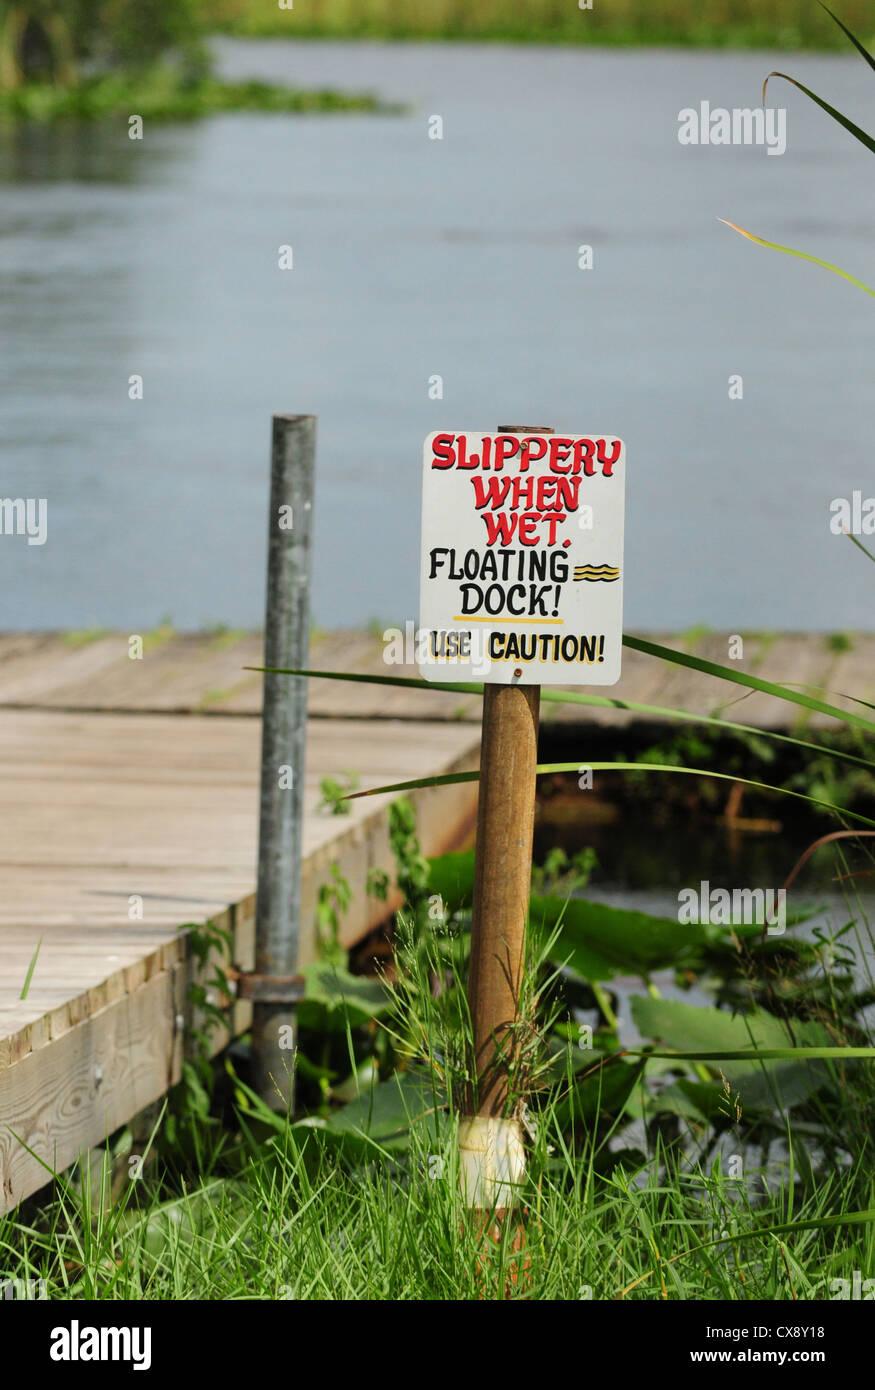 Slippery When Wet firmar en muelle cerca del estanque Imagen De Stock